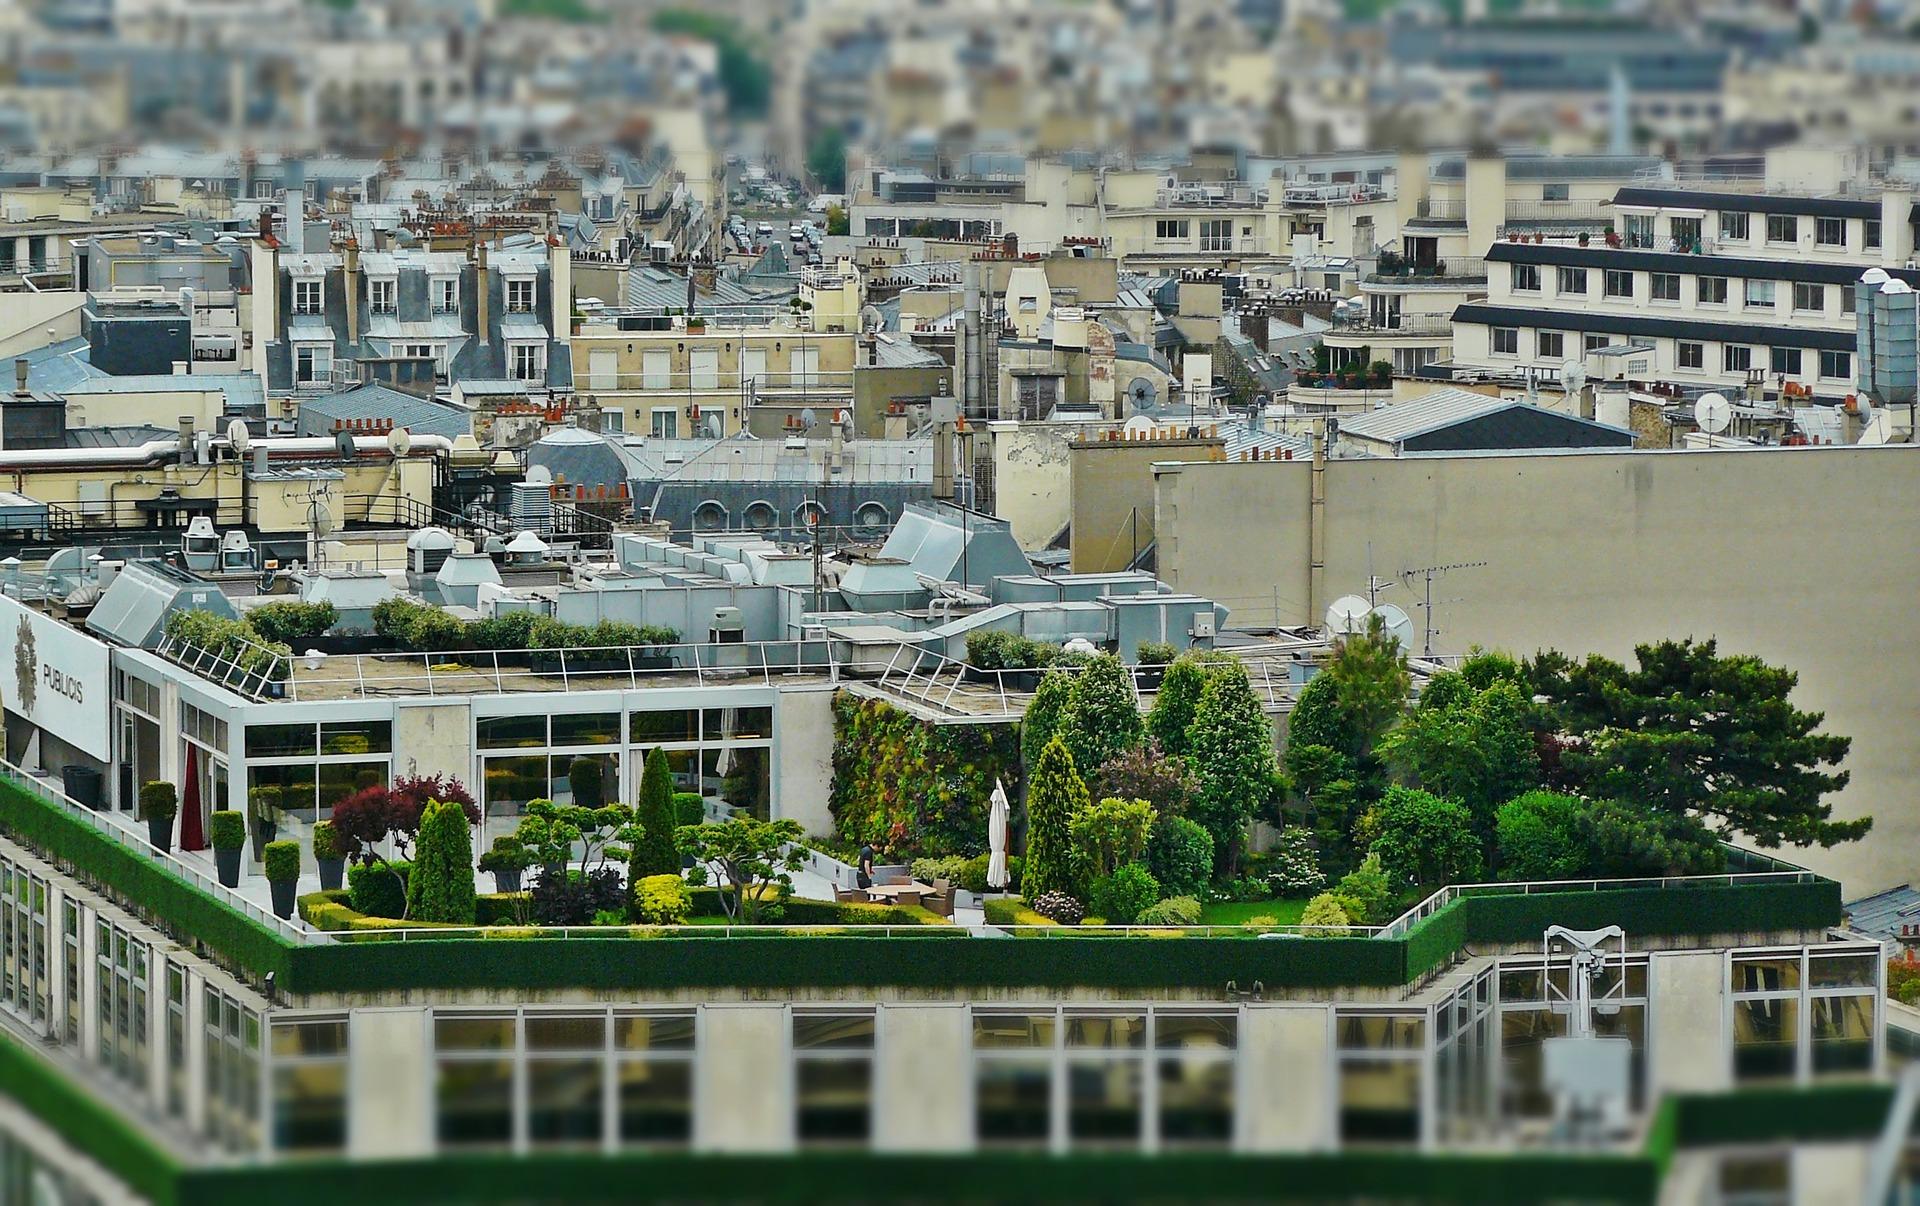 Jardim rooftop